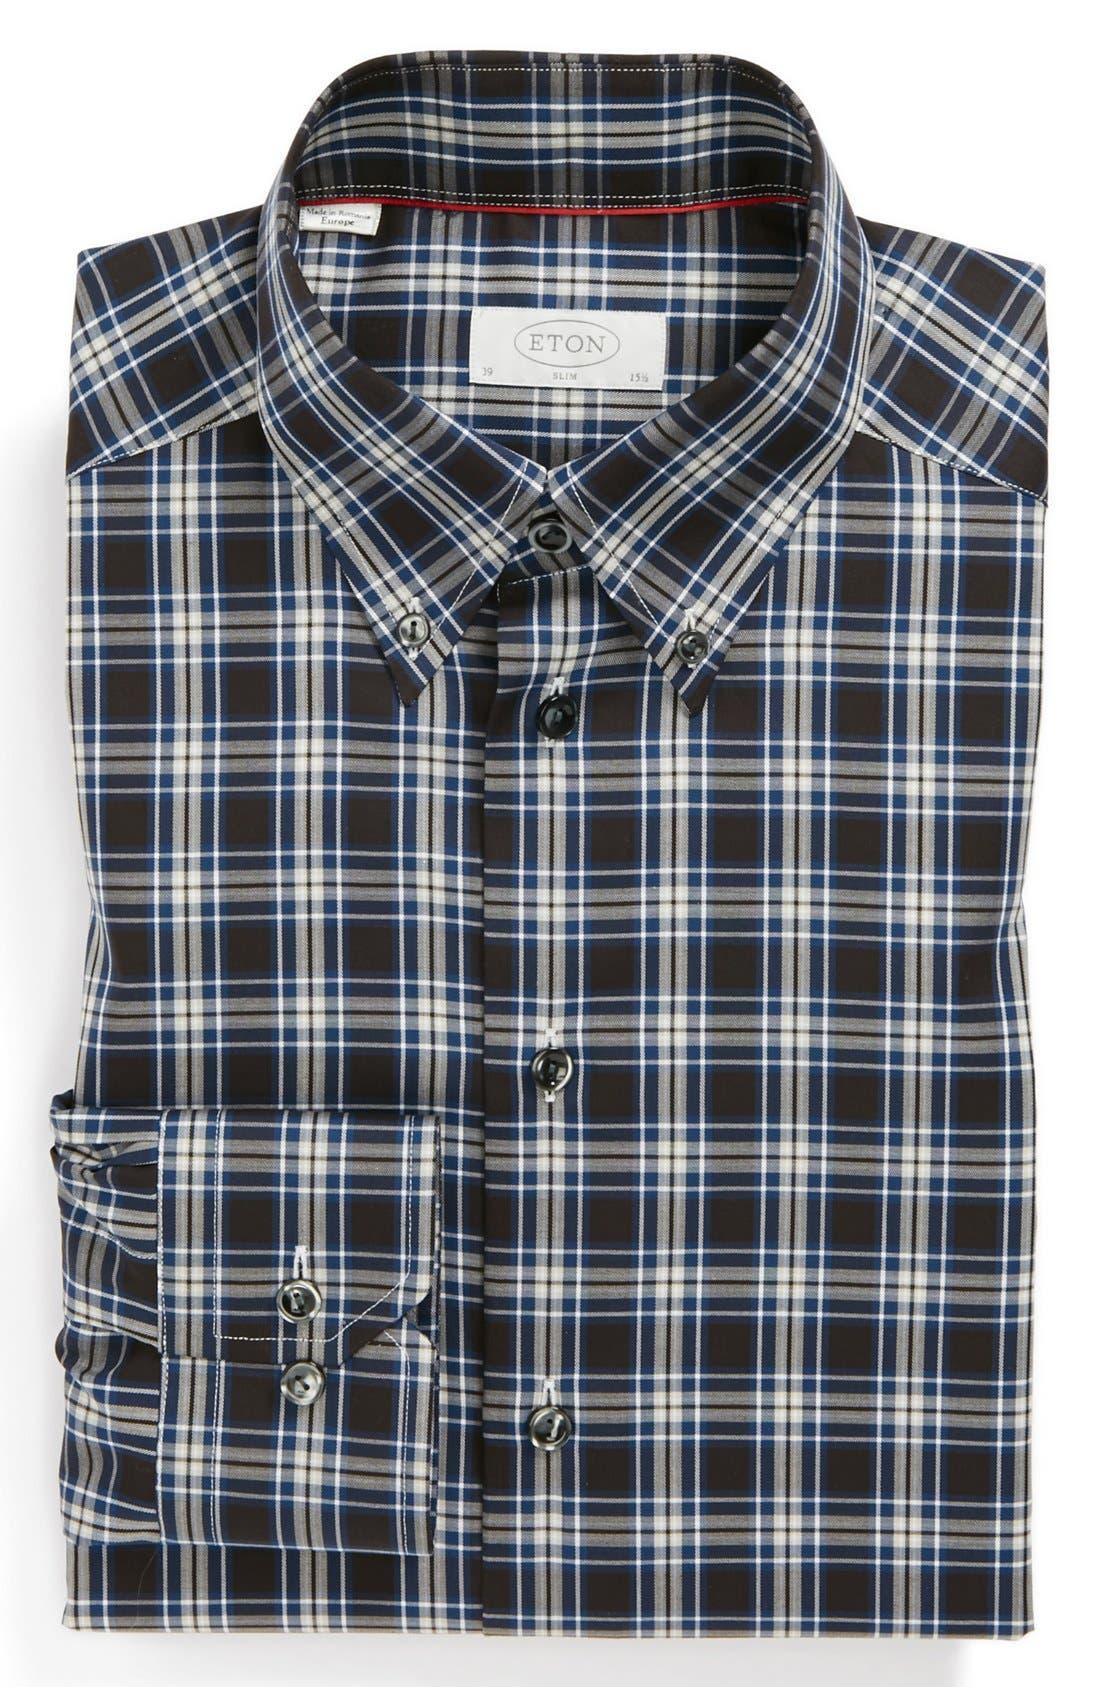 Alternate Image 1 Selected - Eton Slim Fit Non-Iron Dress Shirt